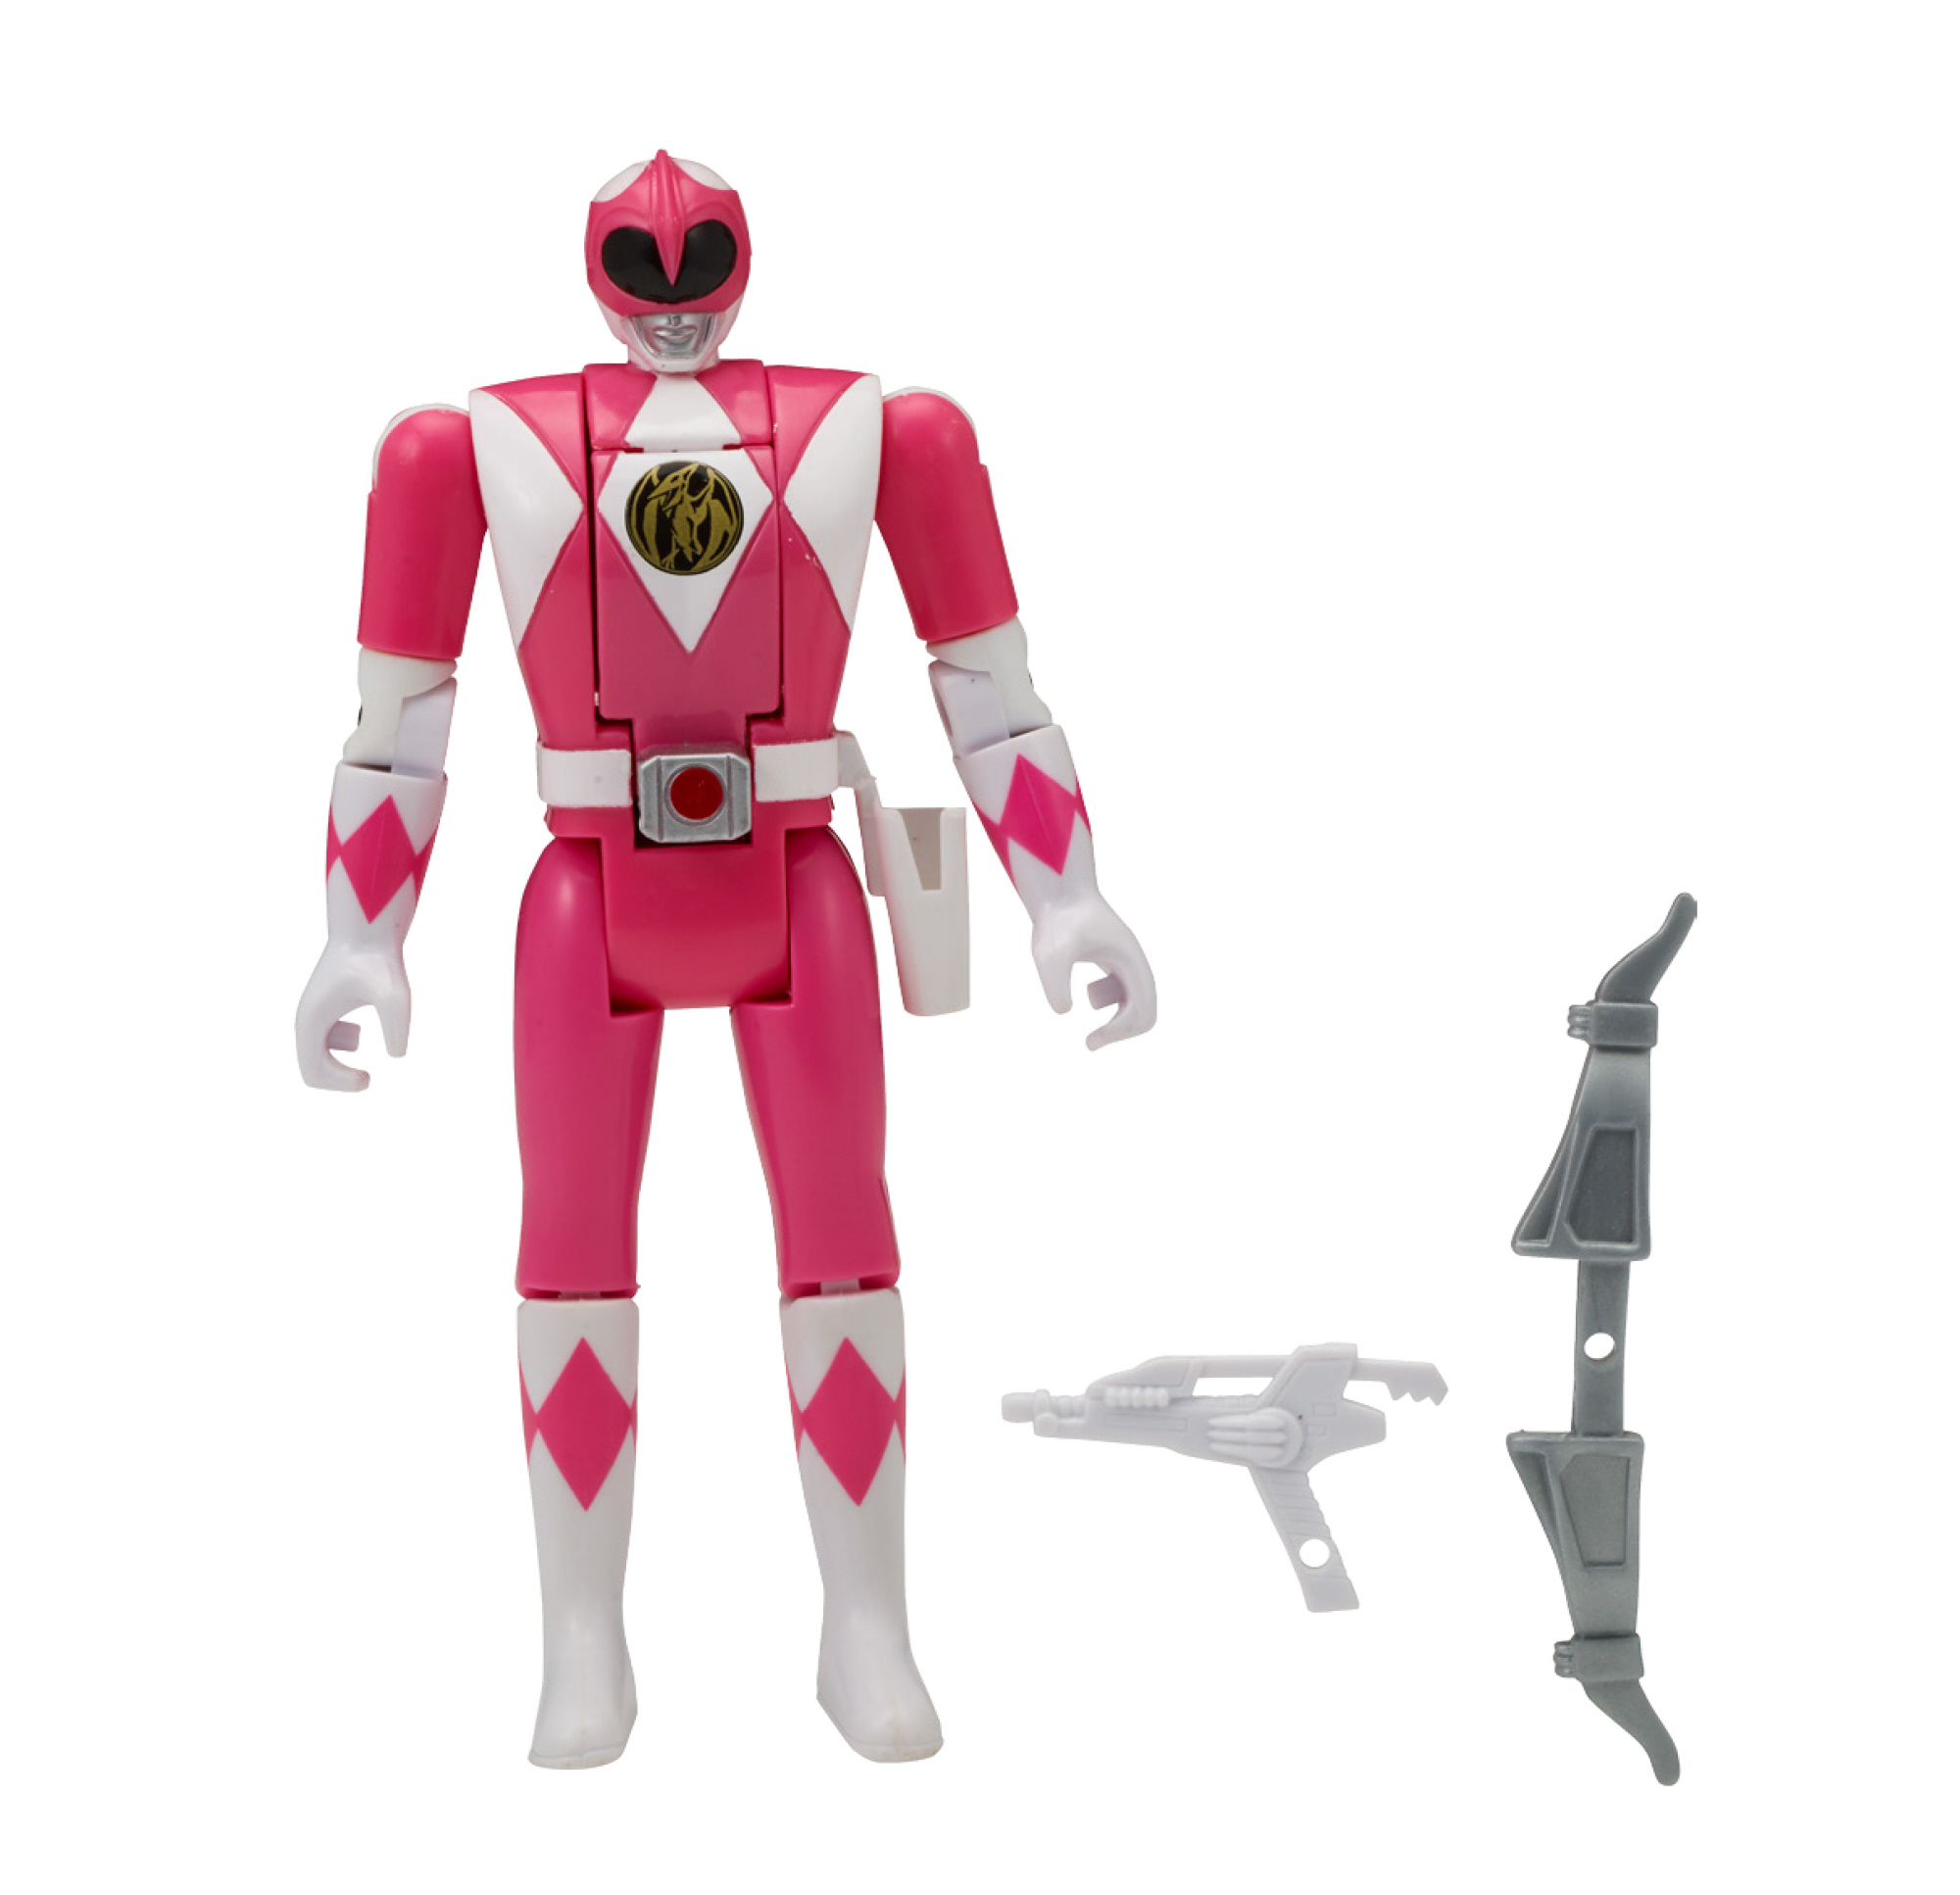 Bandai Power Rangers Mighty Morphin Head Morph Figure, Pink Ranger by Bandai America